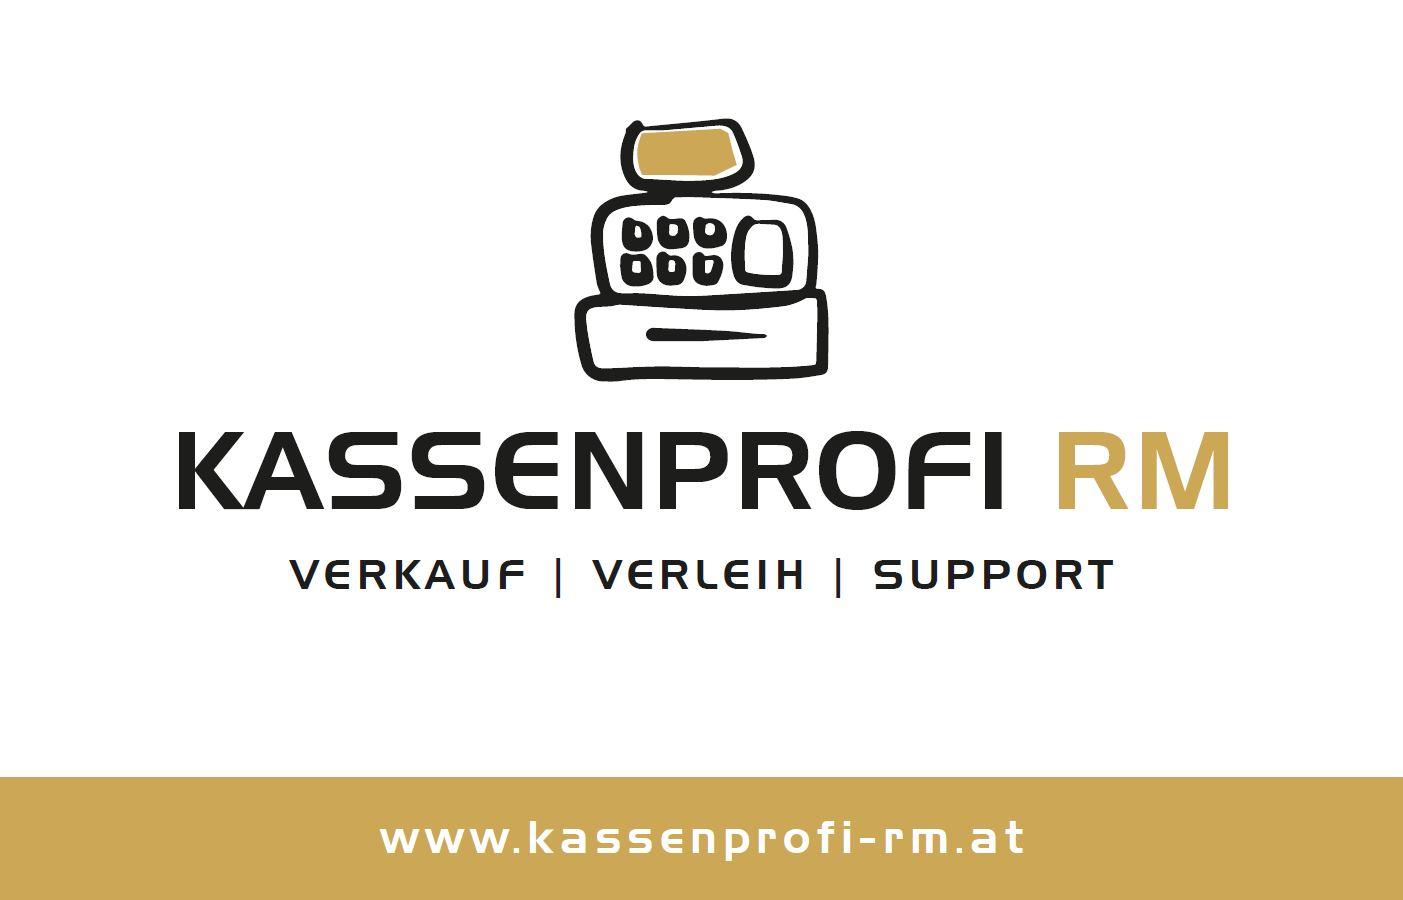 KASSENPROFI-RM